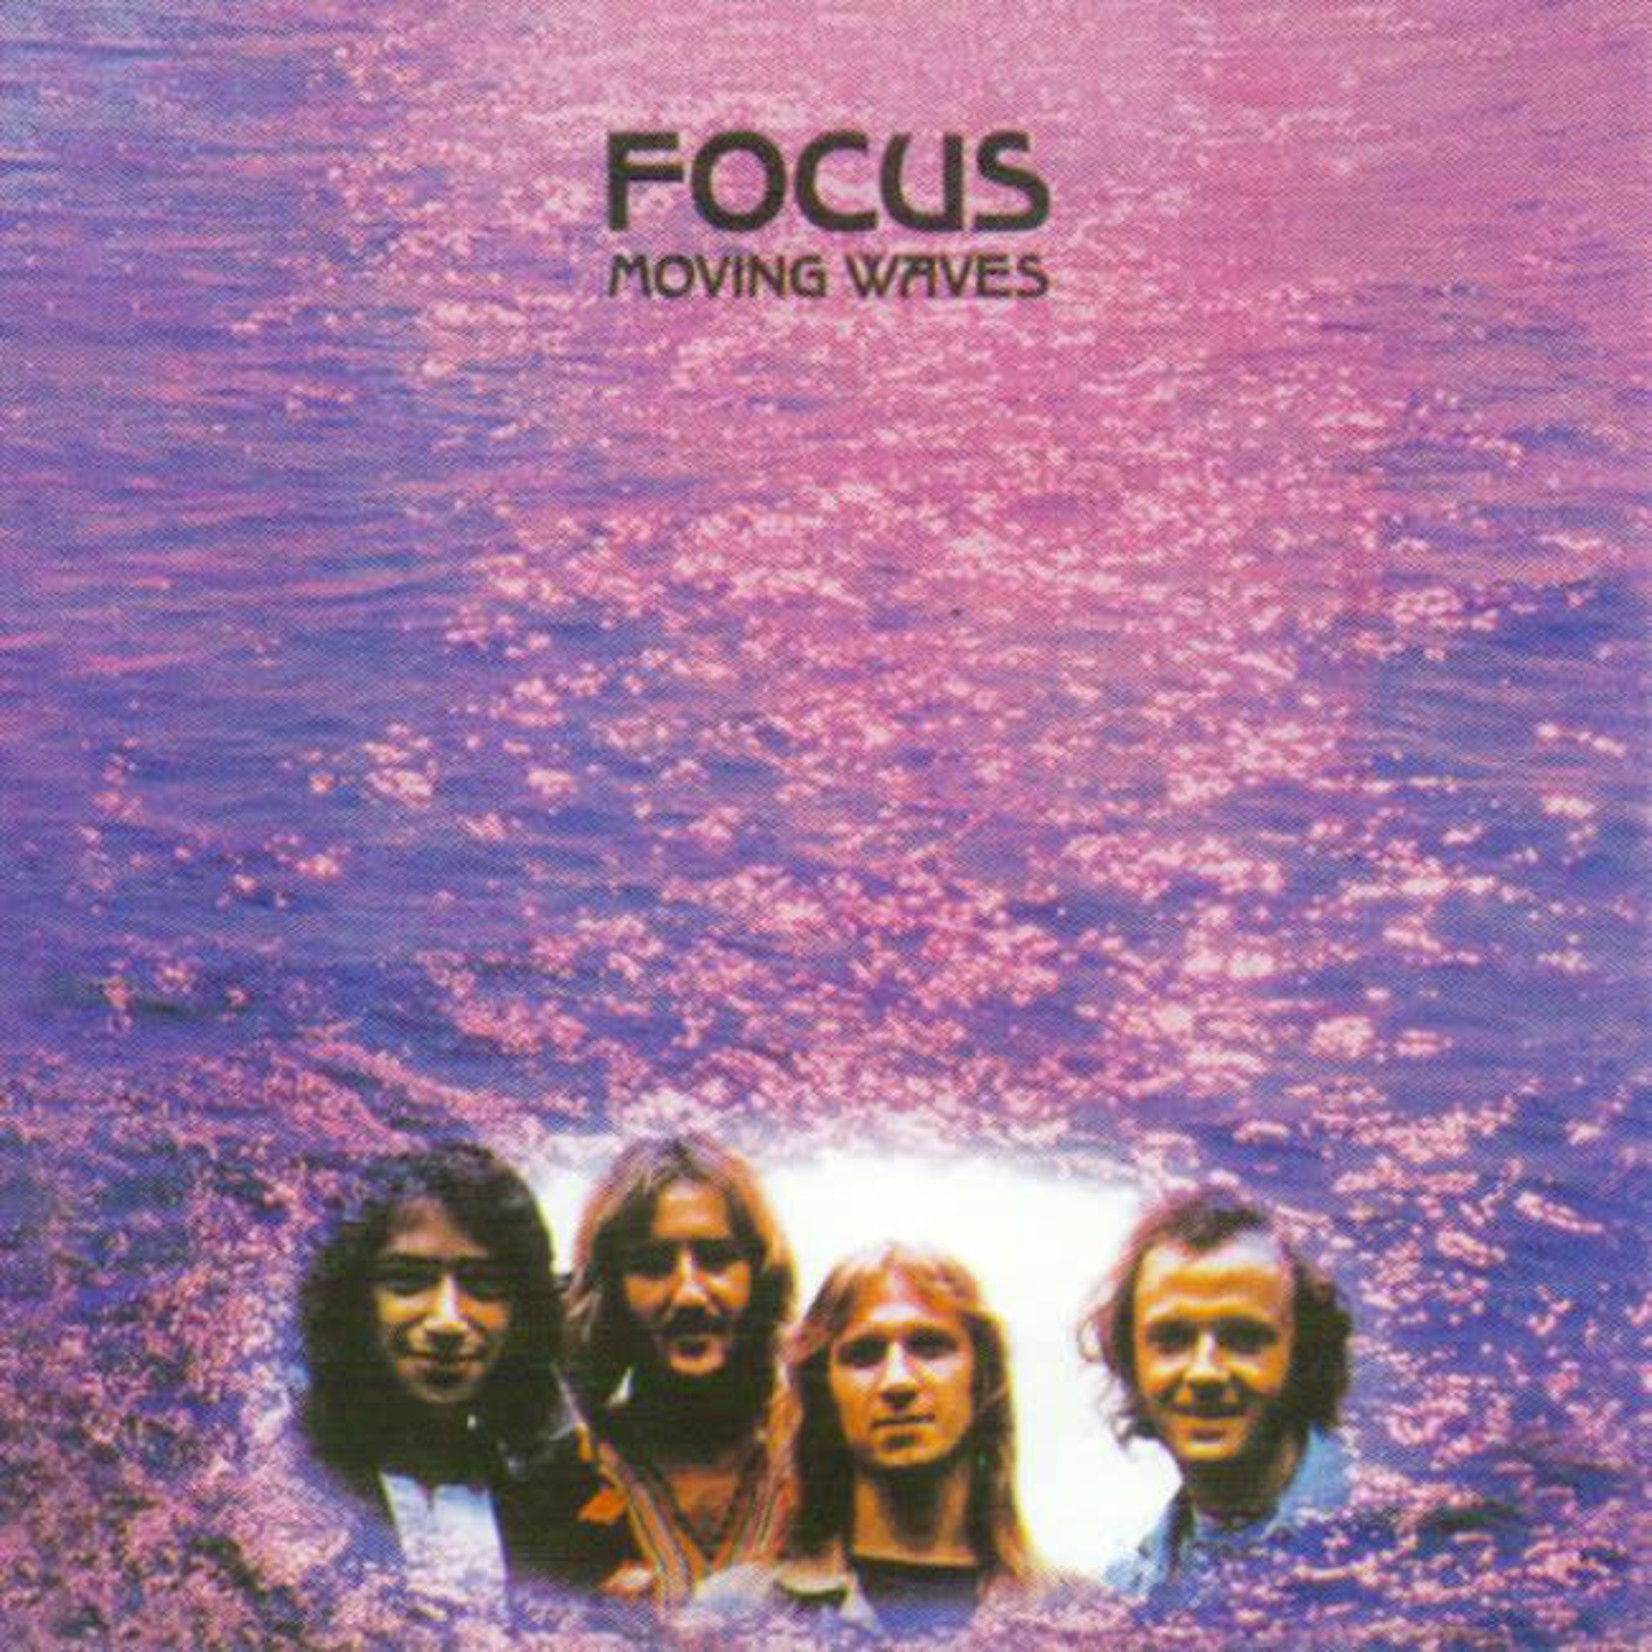 [Vintage] Focus: Moving Waves